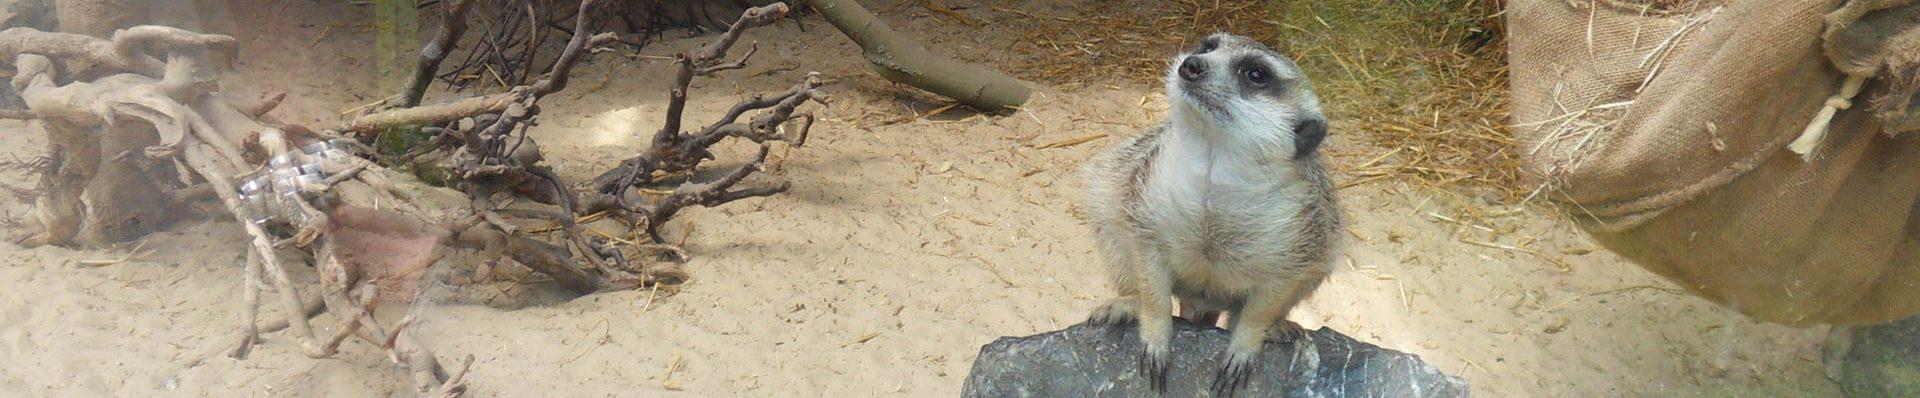 Kategorie: Tierpark Nadermann